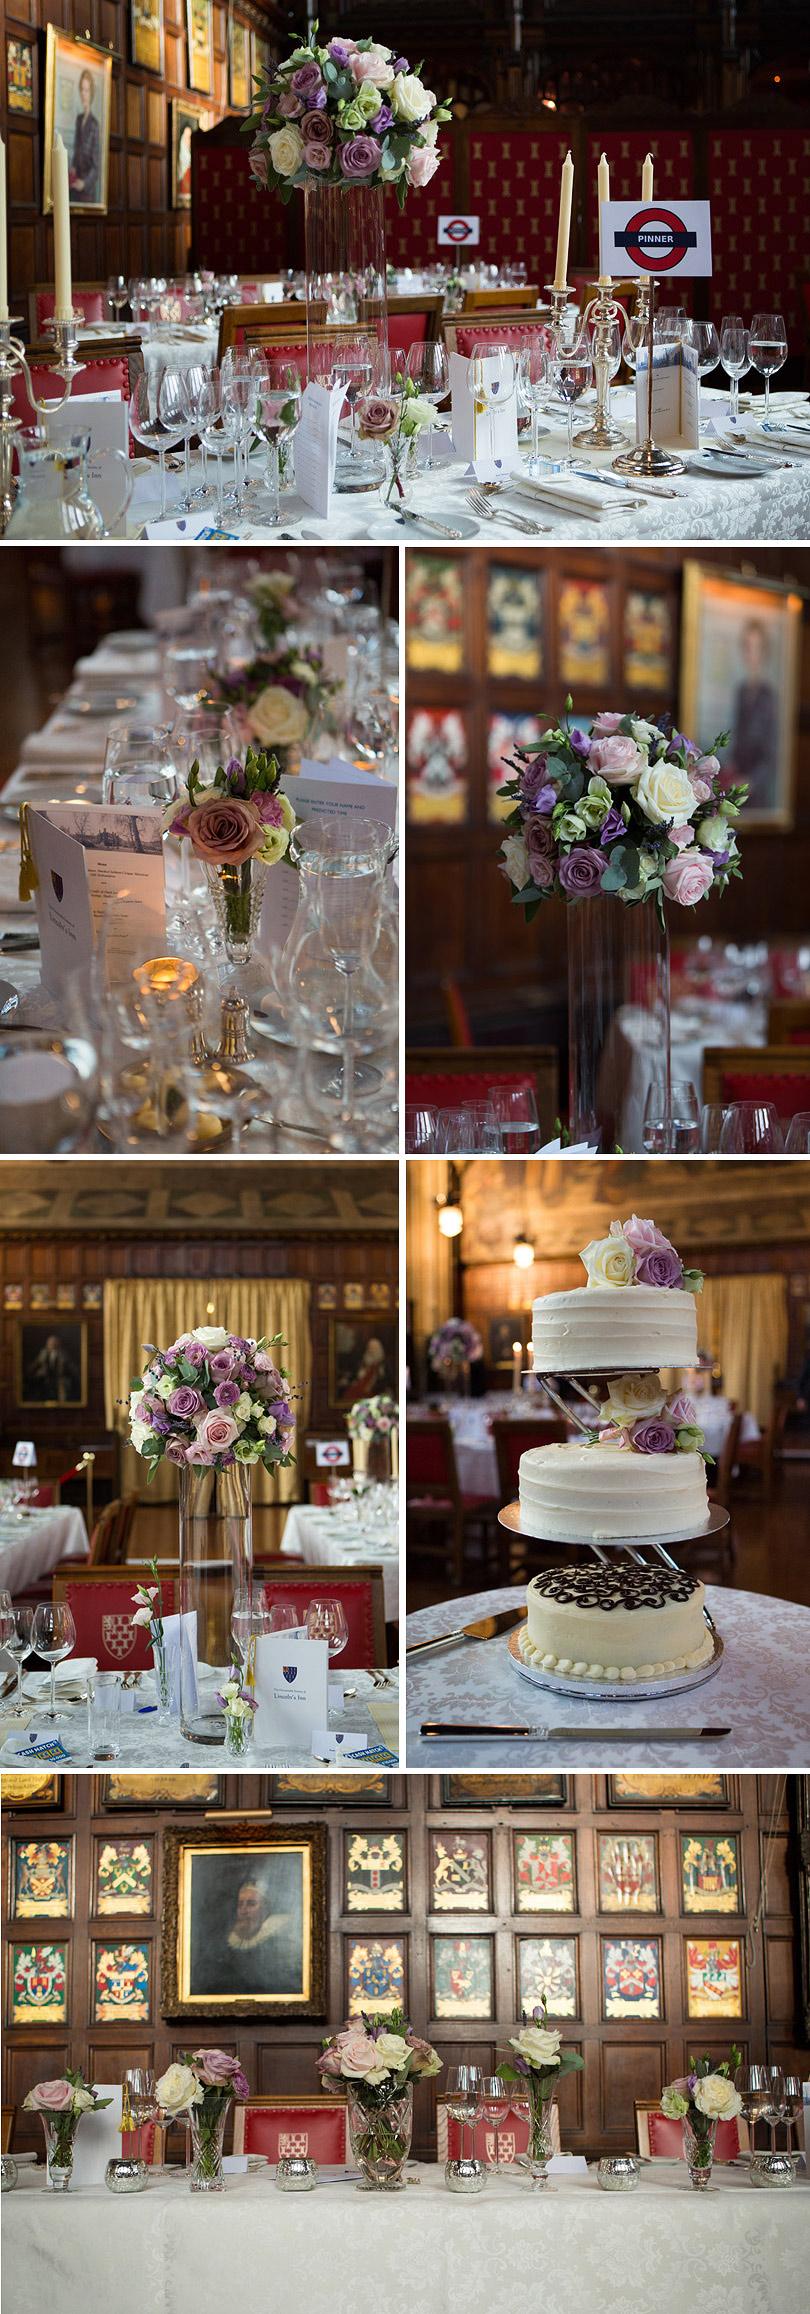 Brompton-Oratory-Lincolns-Inn-Wedding-RachelMax-014.jpg